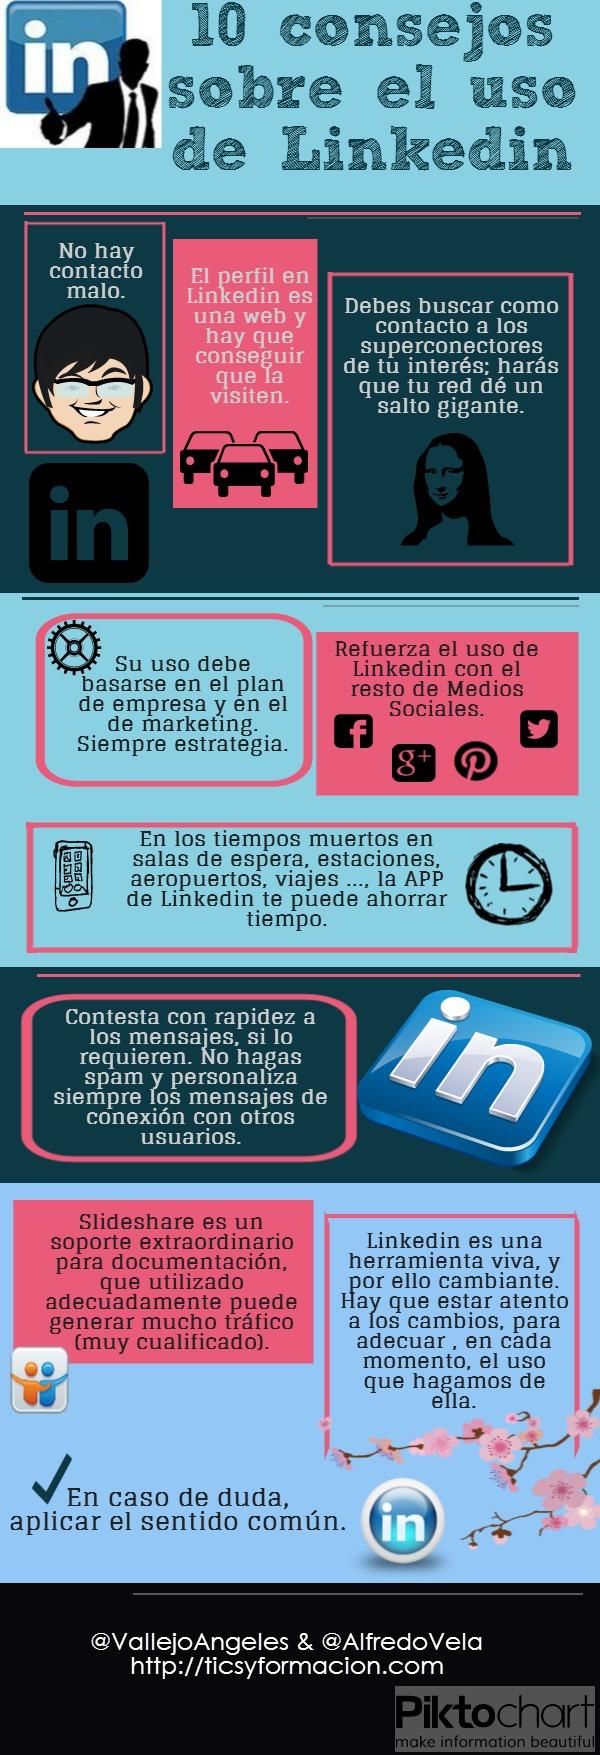 10 consejos sobre el uso de Linkedin